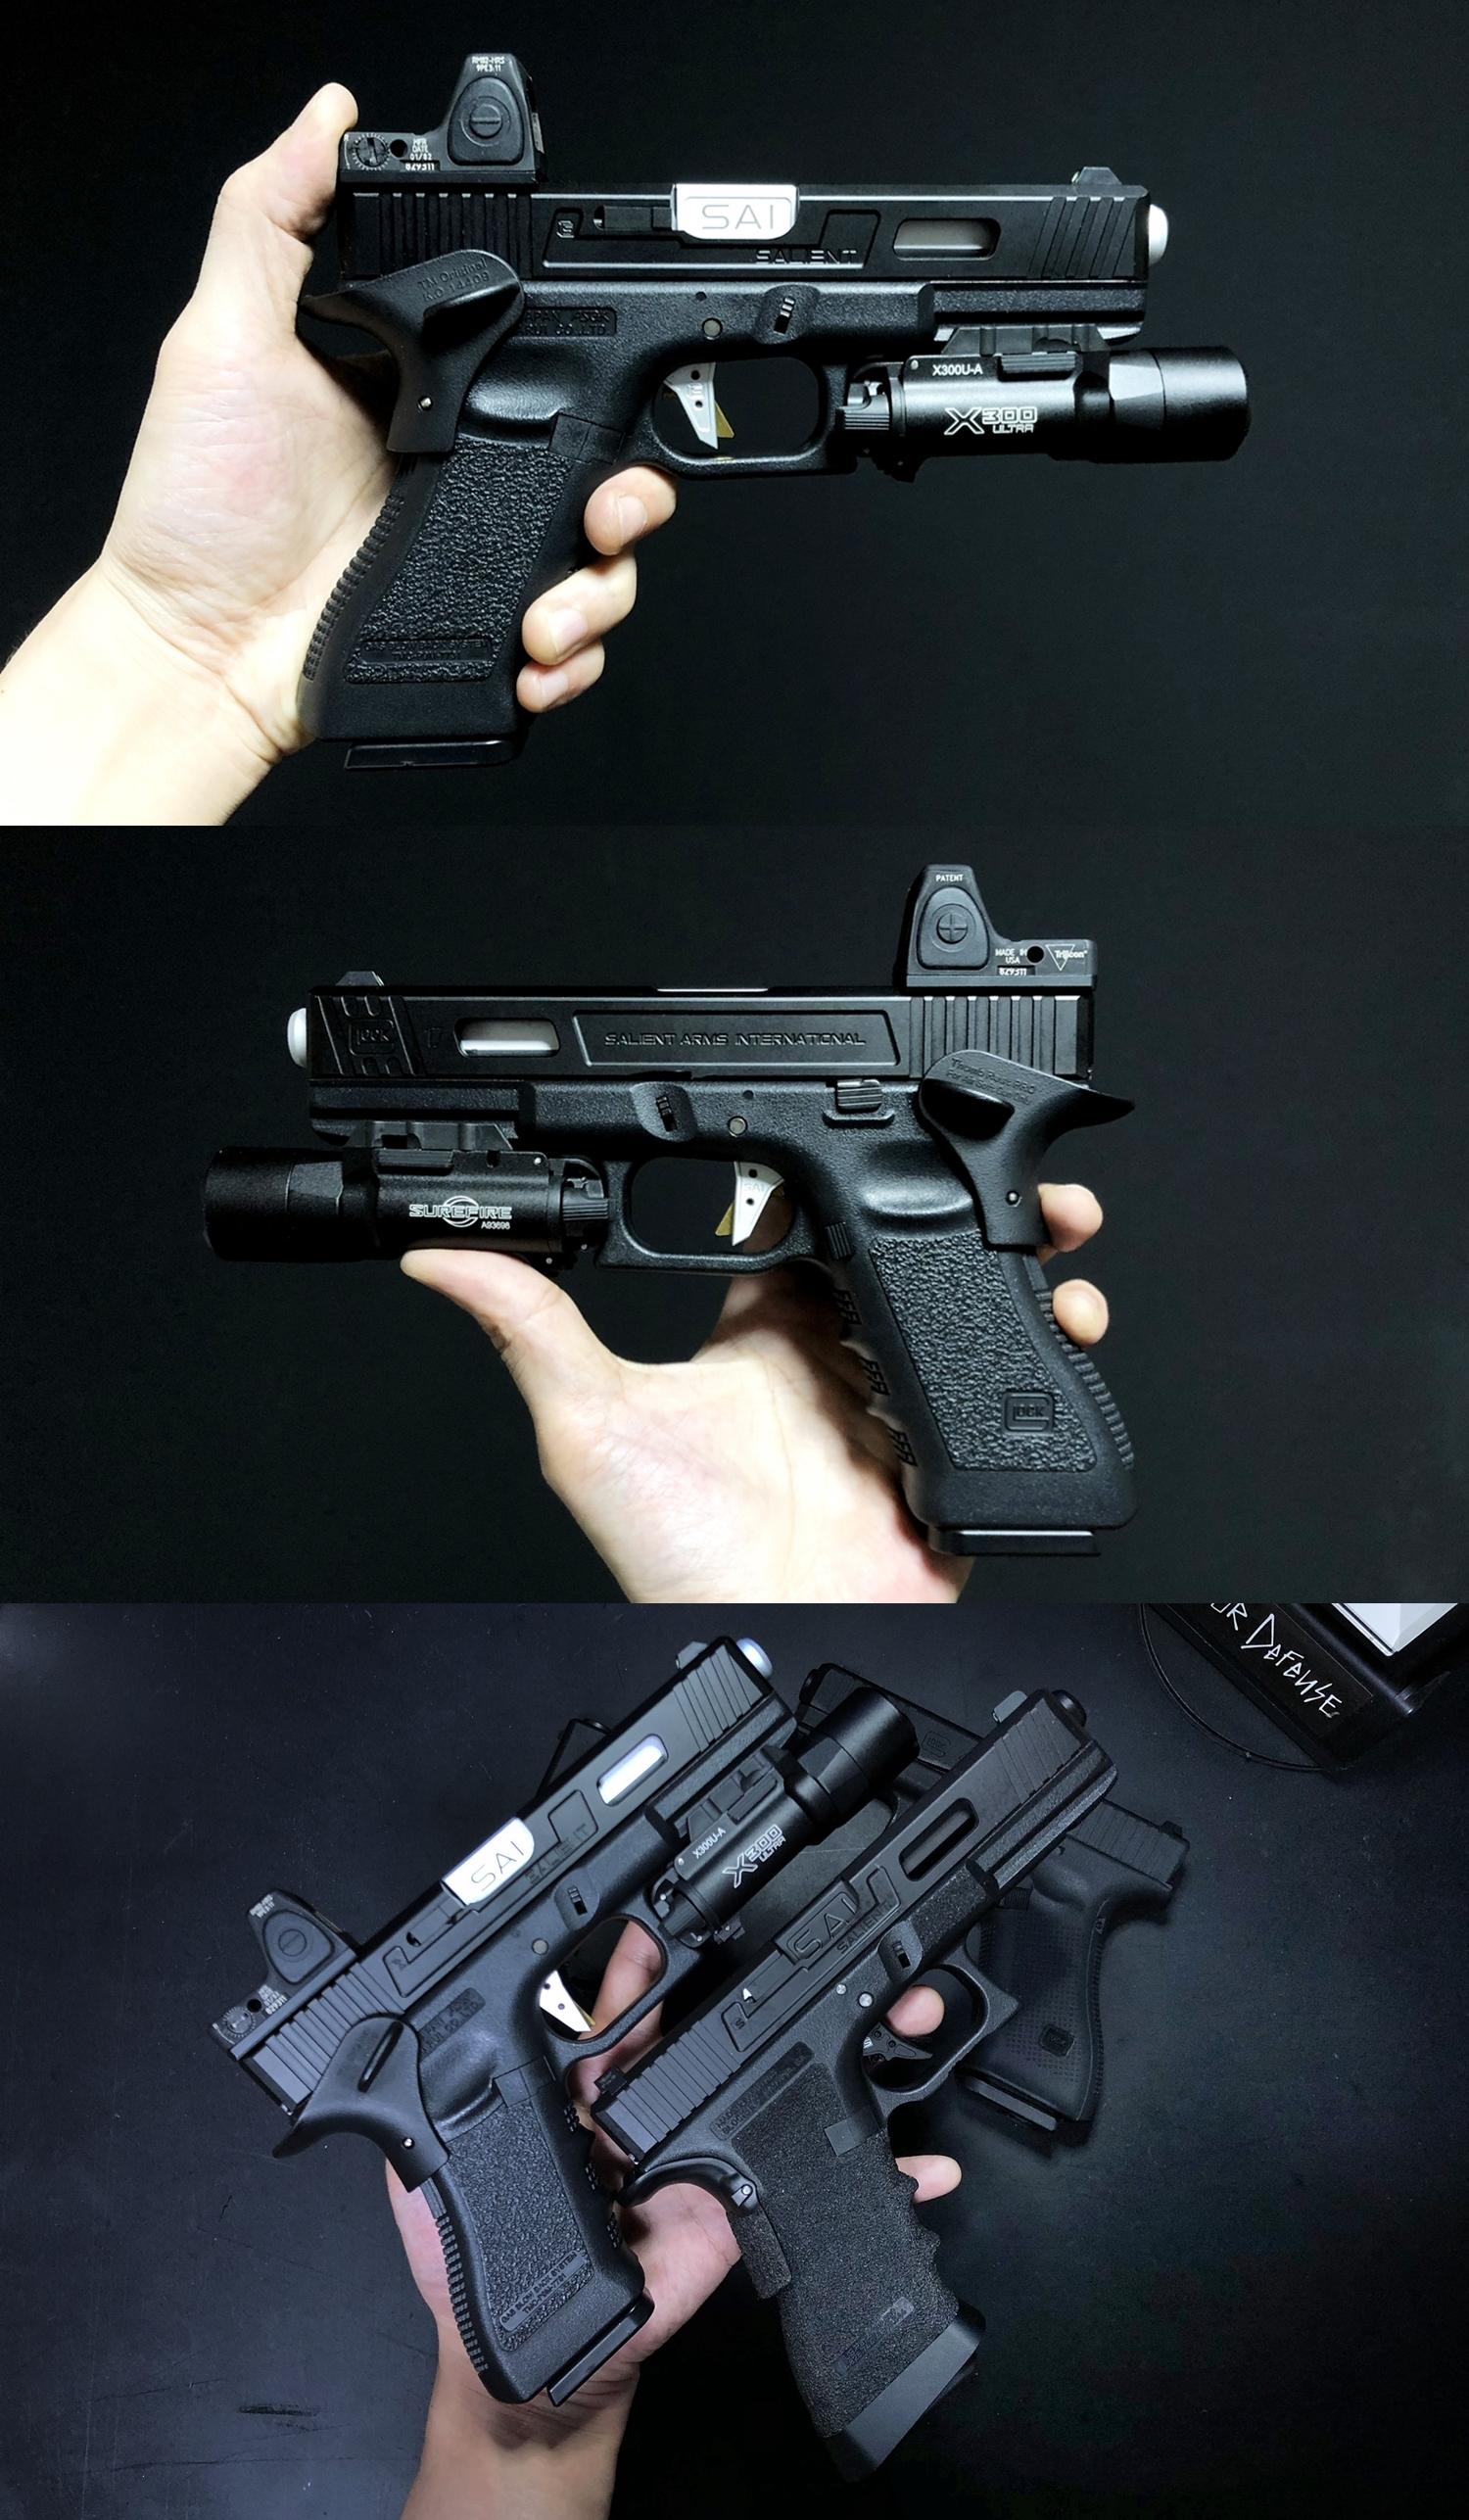 13 HolyWarrior製 RMR Trijicon Type ドットサイト GET!! 噂のHW製 最新 超軽量 複合材質 樹脂 タイプを購入したけど速攻で仲間に奪われました(笑)!! Glock G17 GBB カスタム!! 購入 開封 取付 加工 レビュー!!